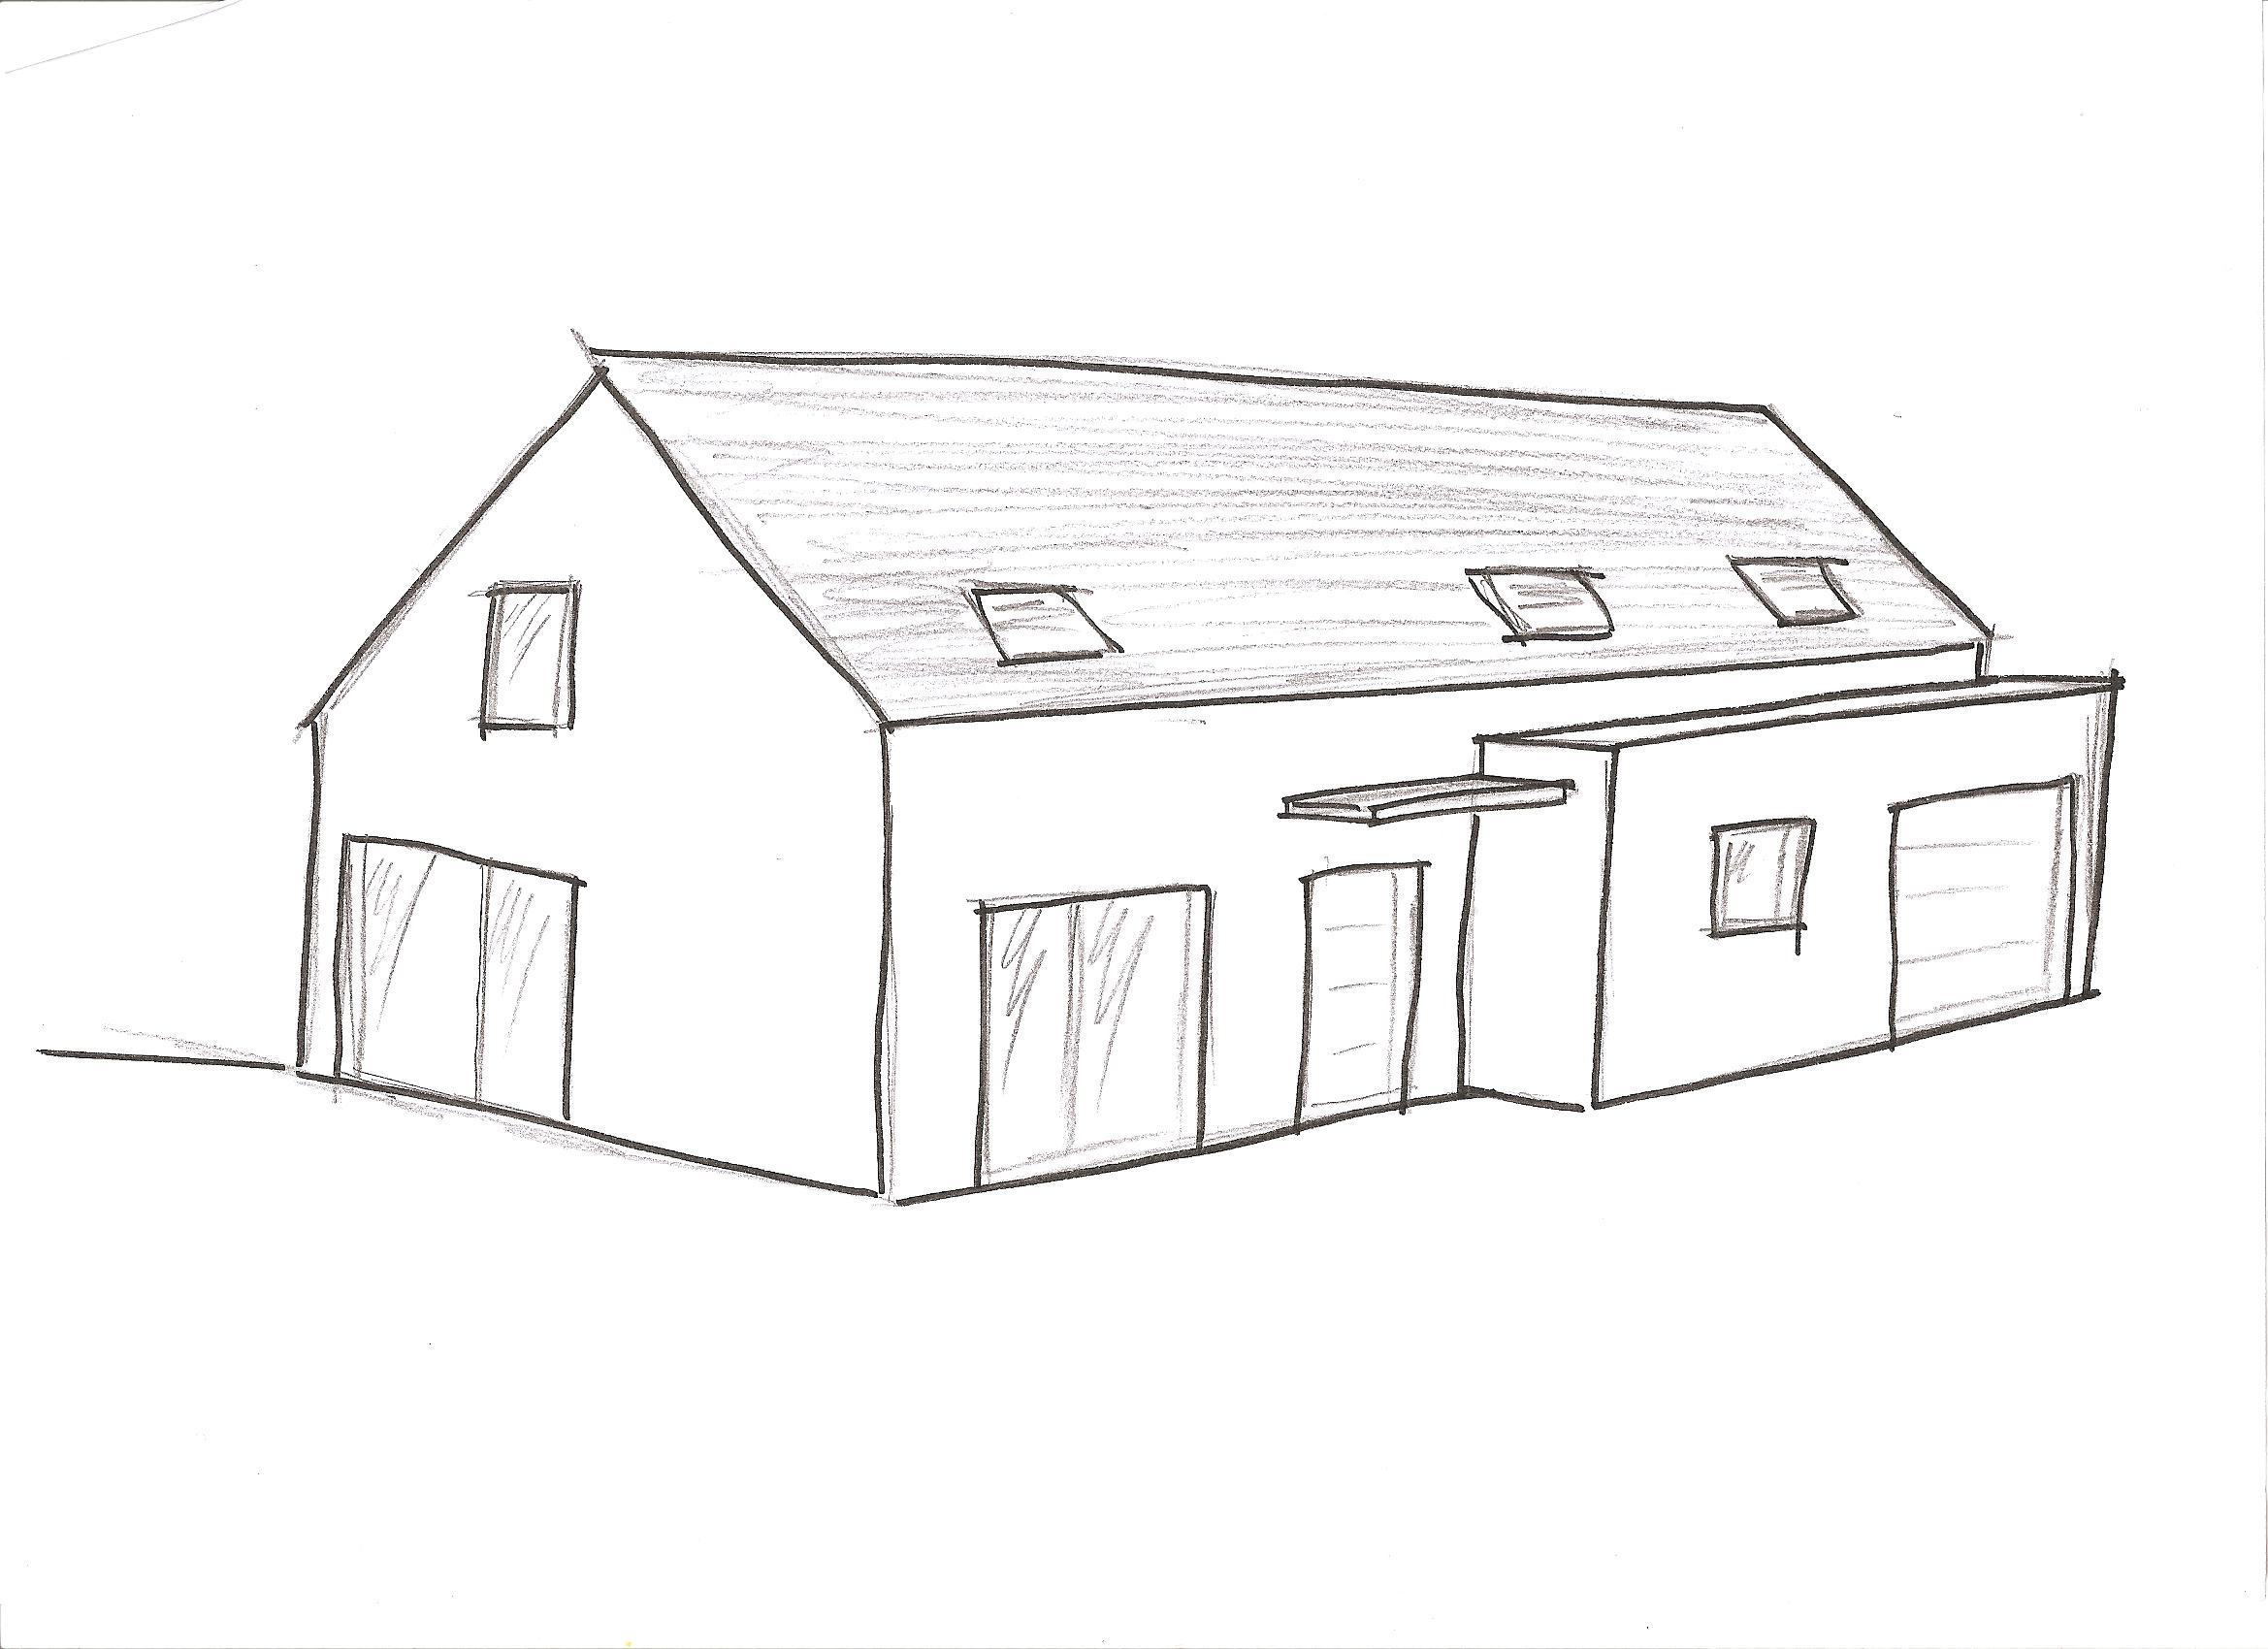 Apprendre A Dessiner Une Maison Gamboahinestrosa